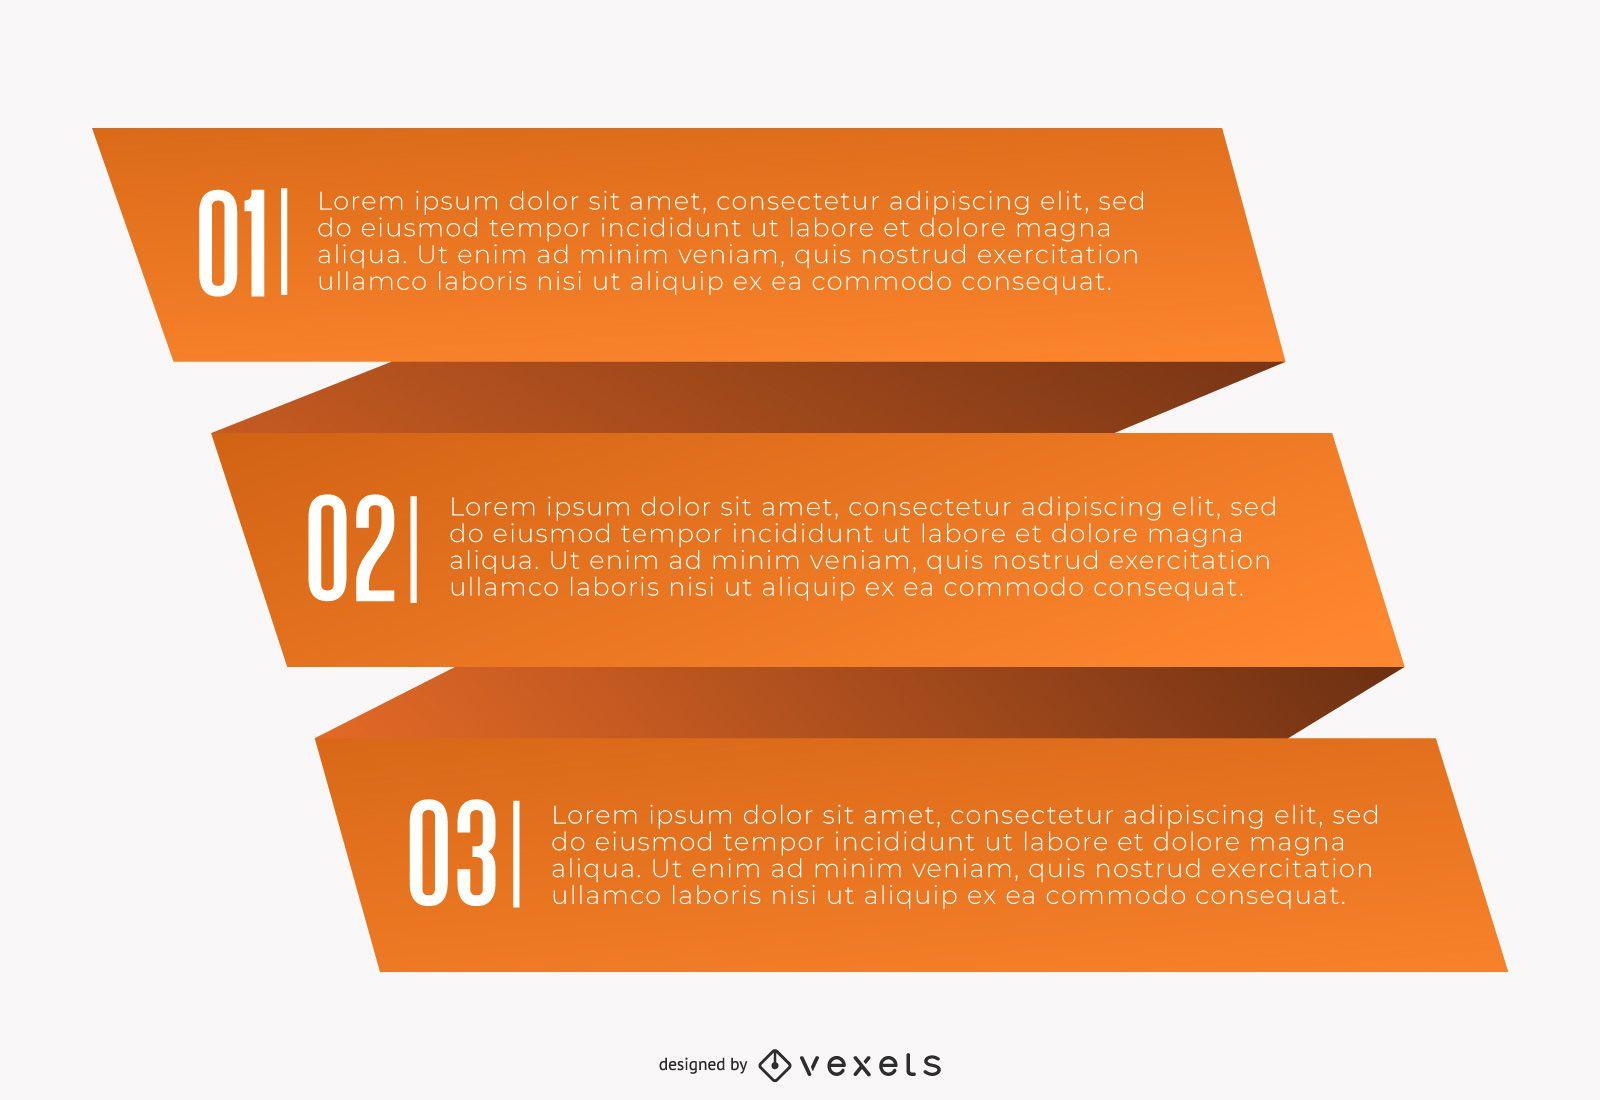 Infografía de origami creativo de tres pliegues